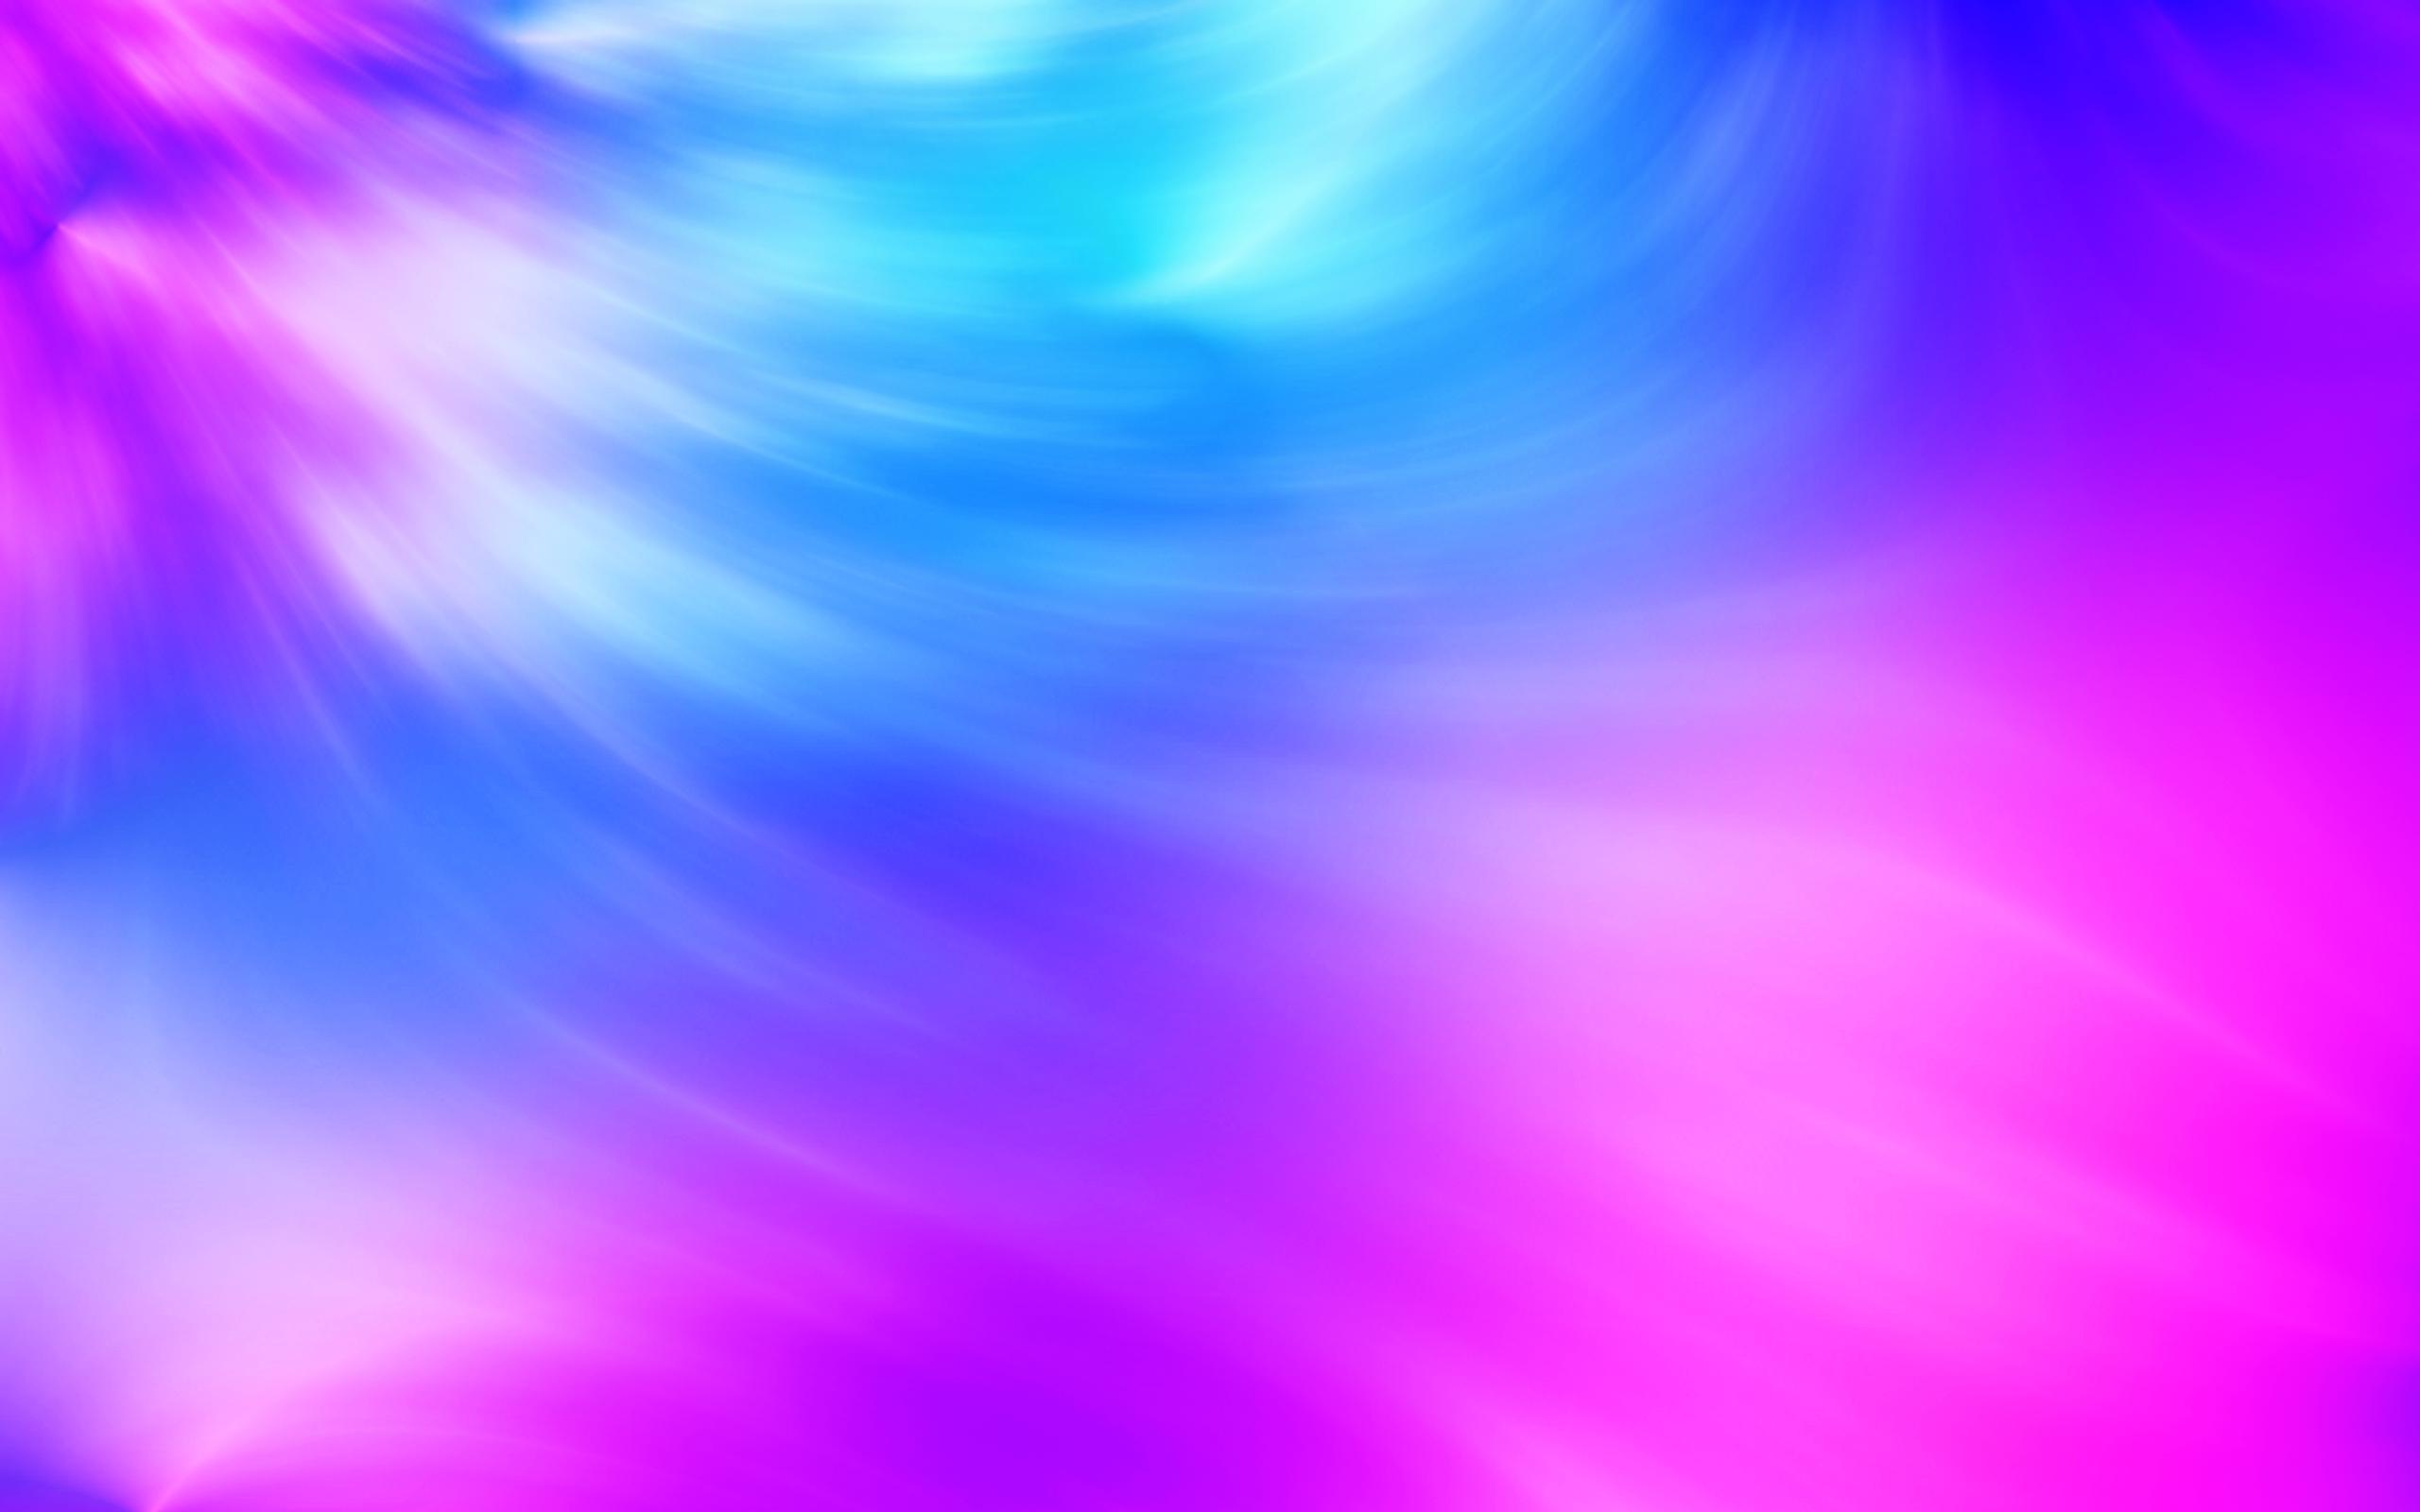 Texture Full HD Fond d'écran and Arrière-plan | 2560x1600 | ID:330165